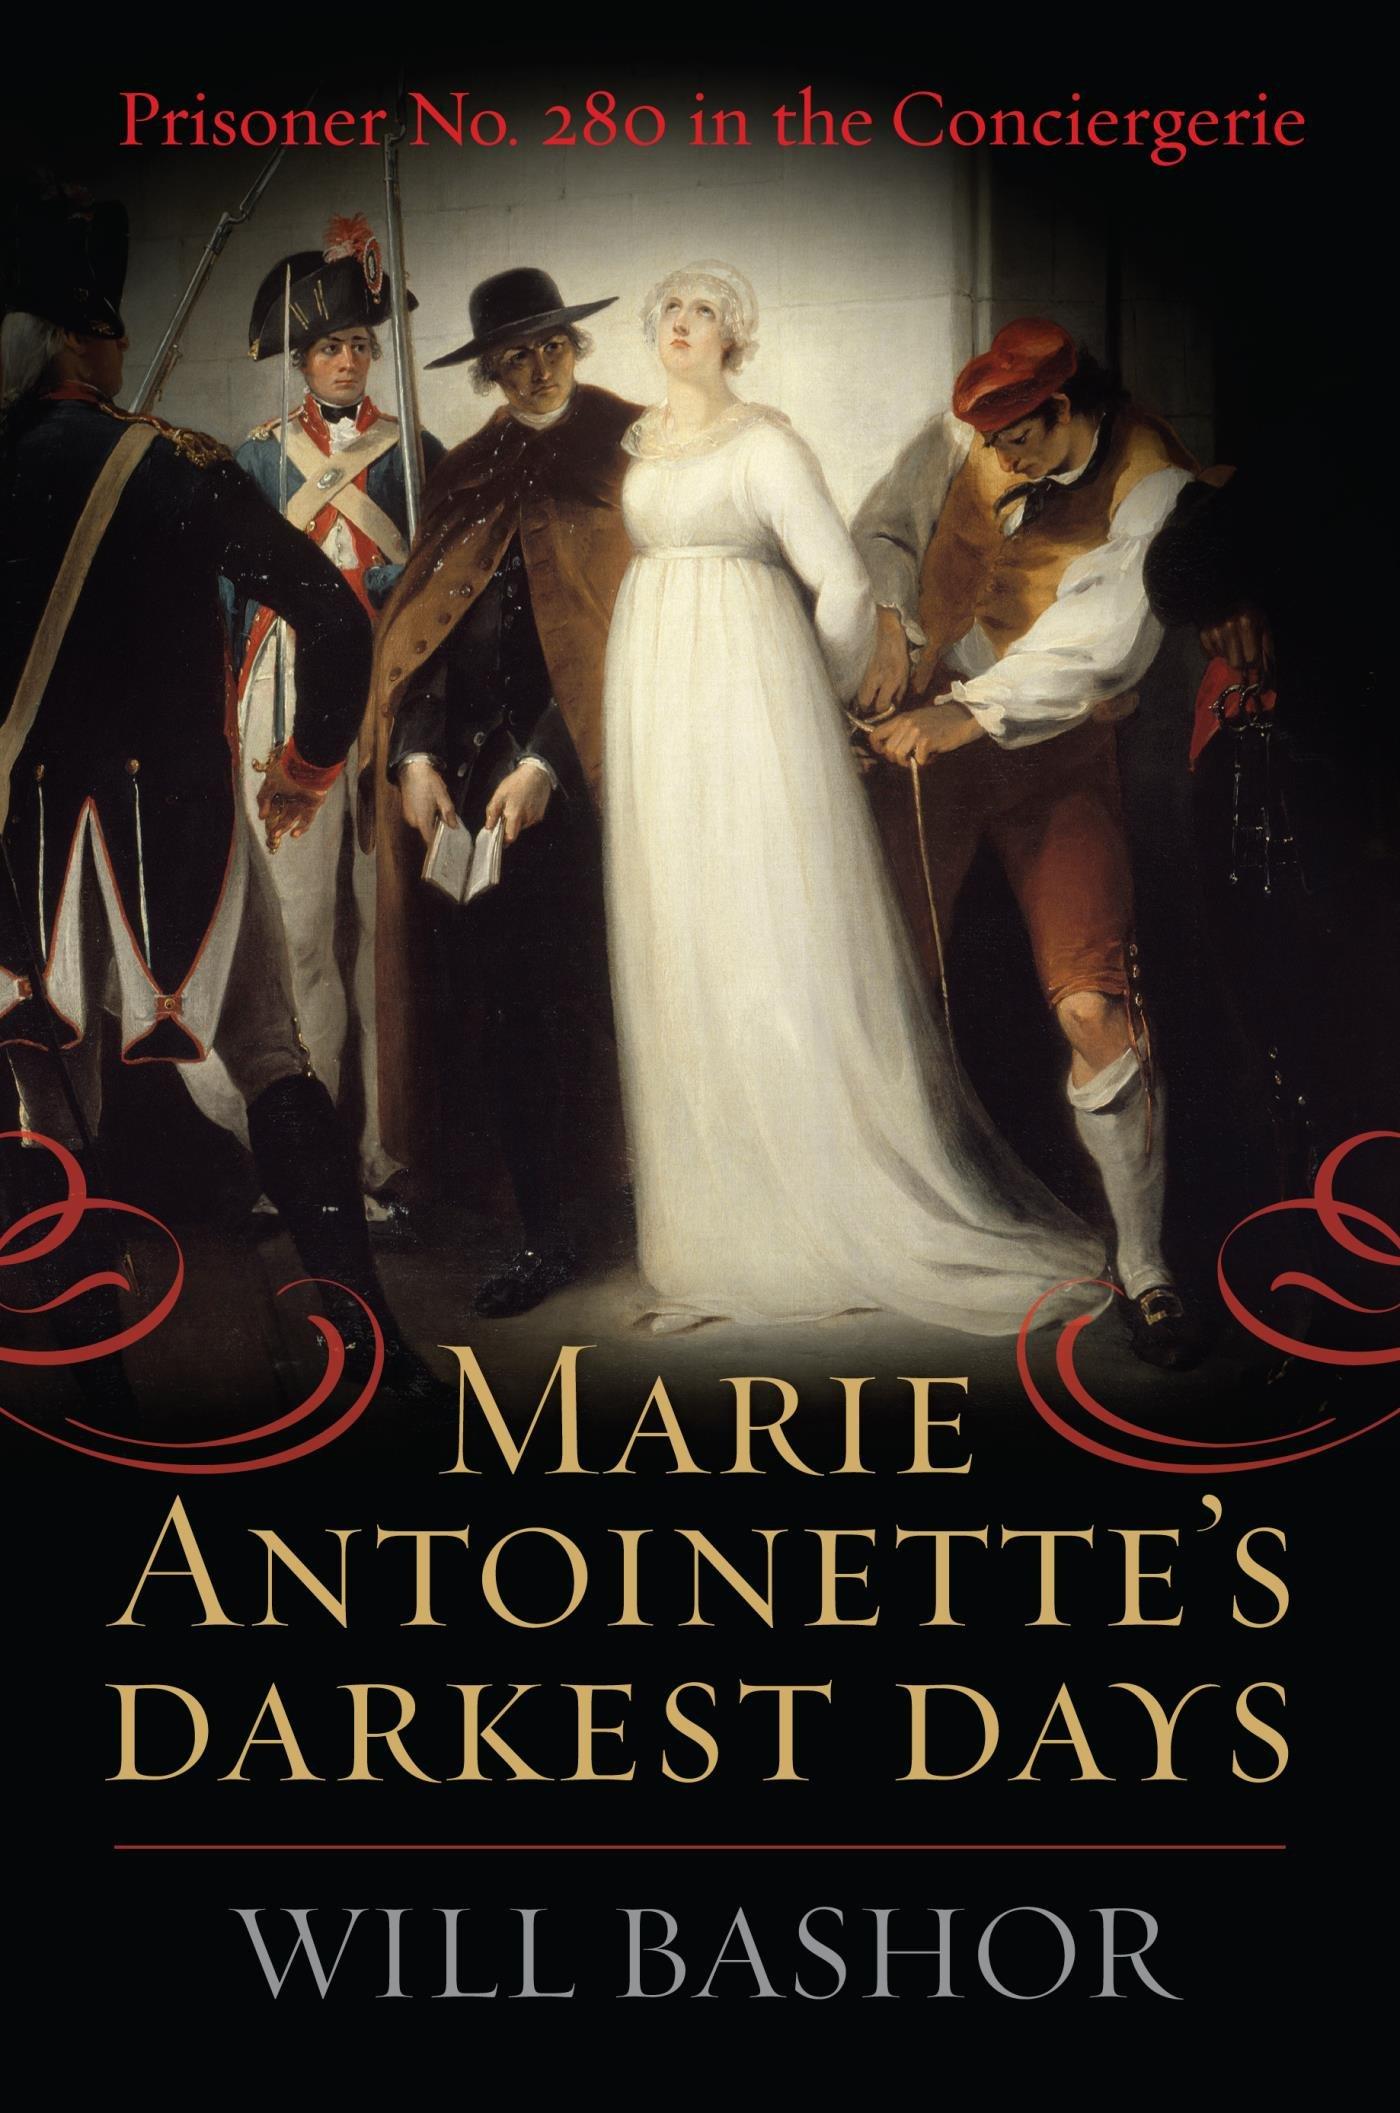 Marie Antoinette's Darkest Days: Prisoner No. 280 in the Conciergerie (English Edition)